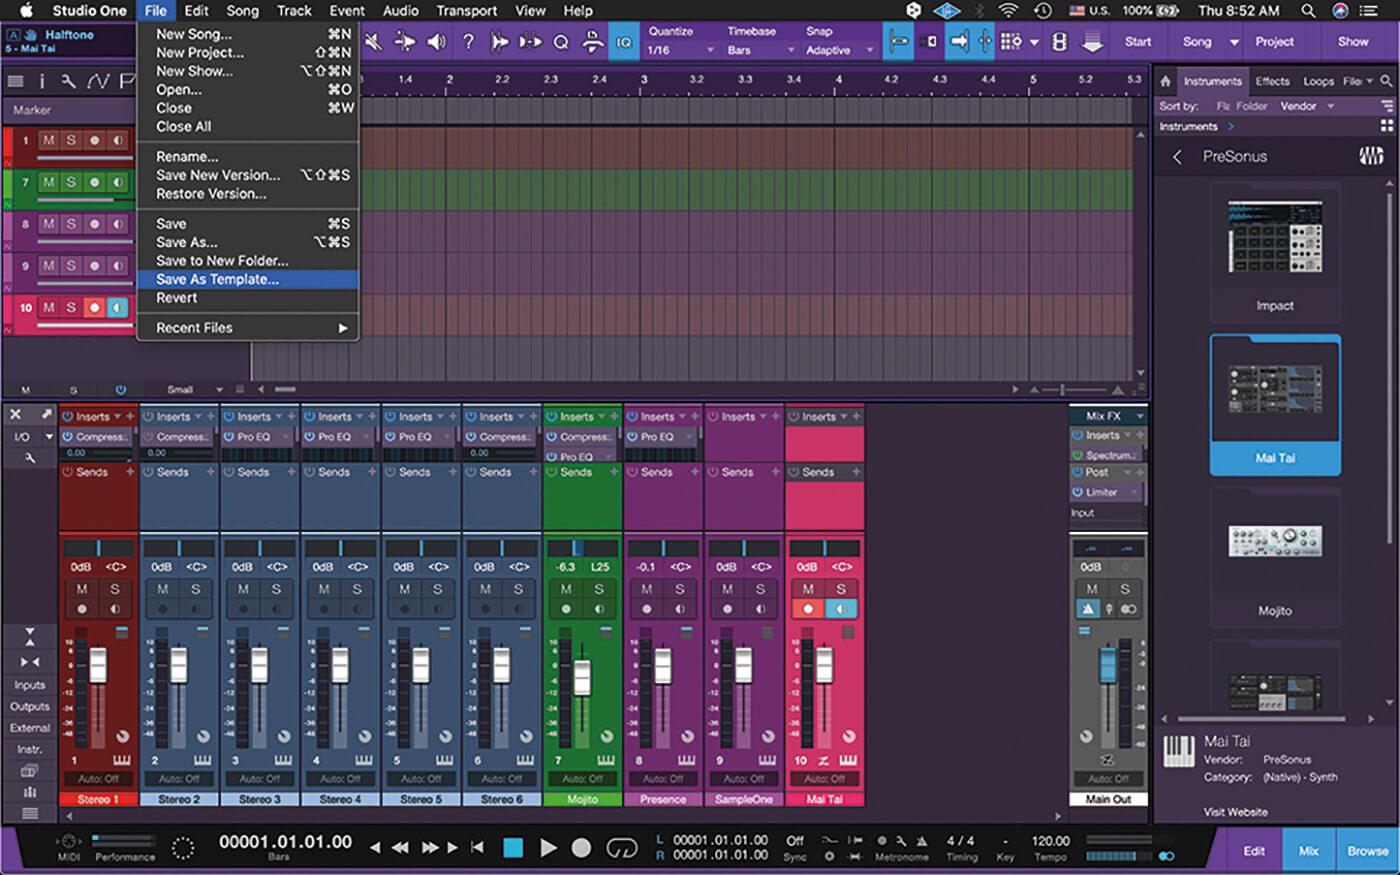 MT211 Studio One 5 Tips 10